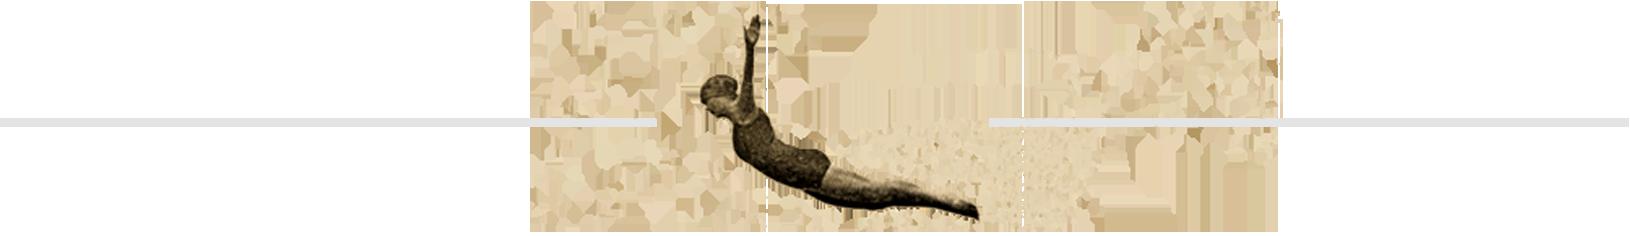 Stefanie Fryland Clausen - Olympic Gold - 1920 - Antwerp - Belgium